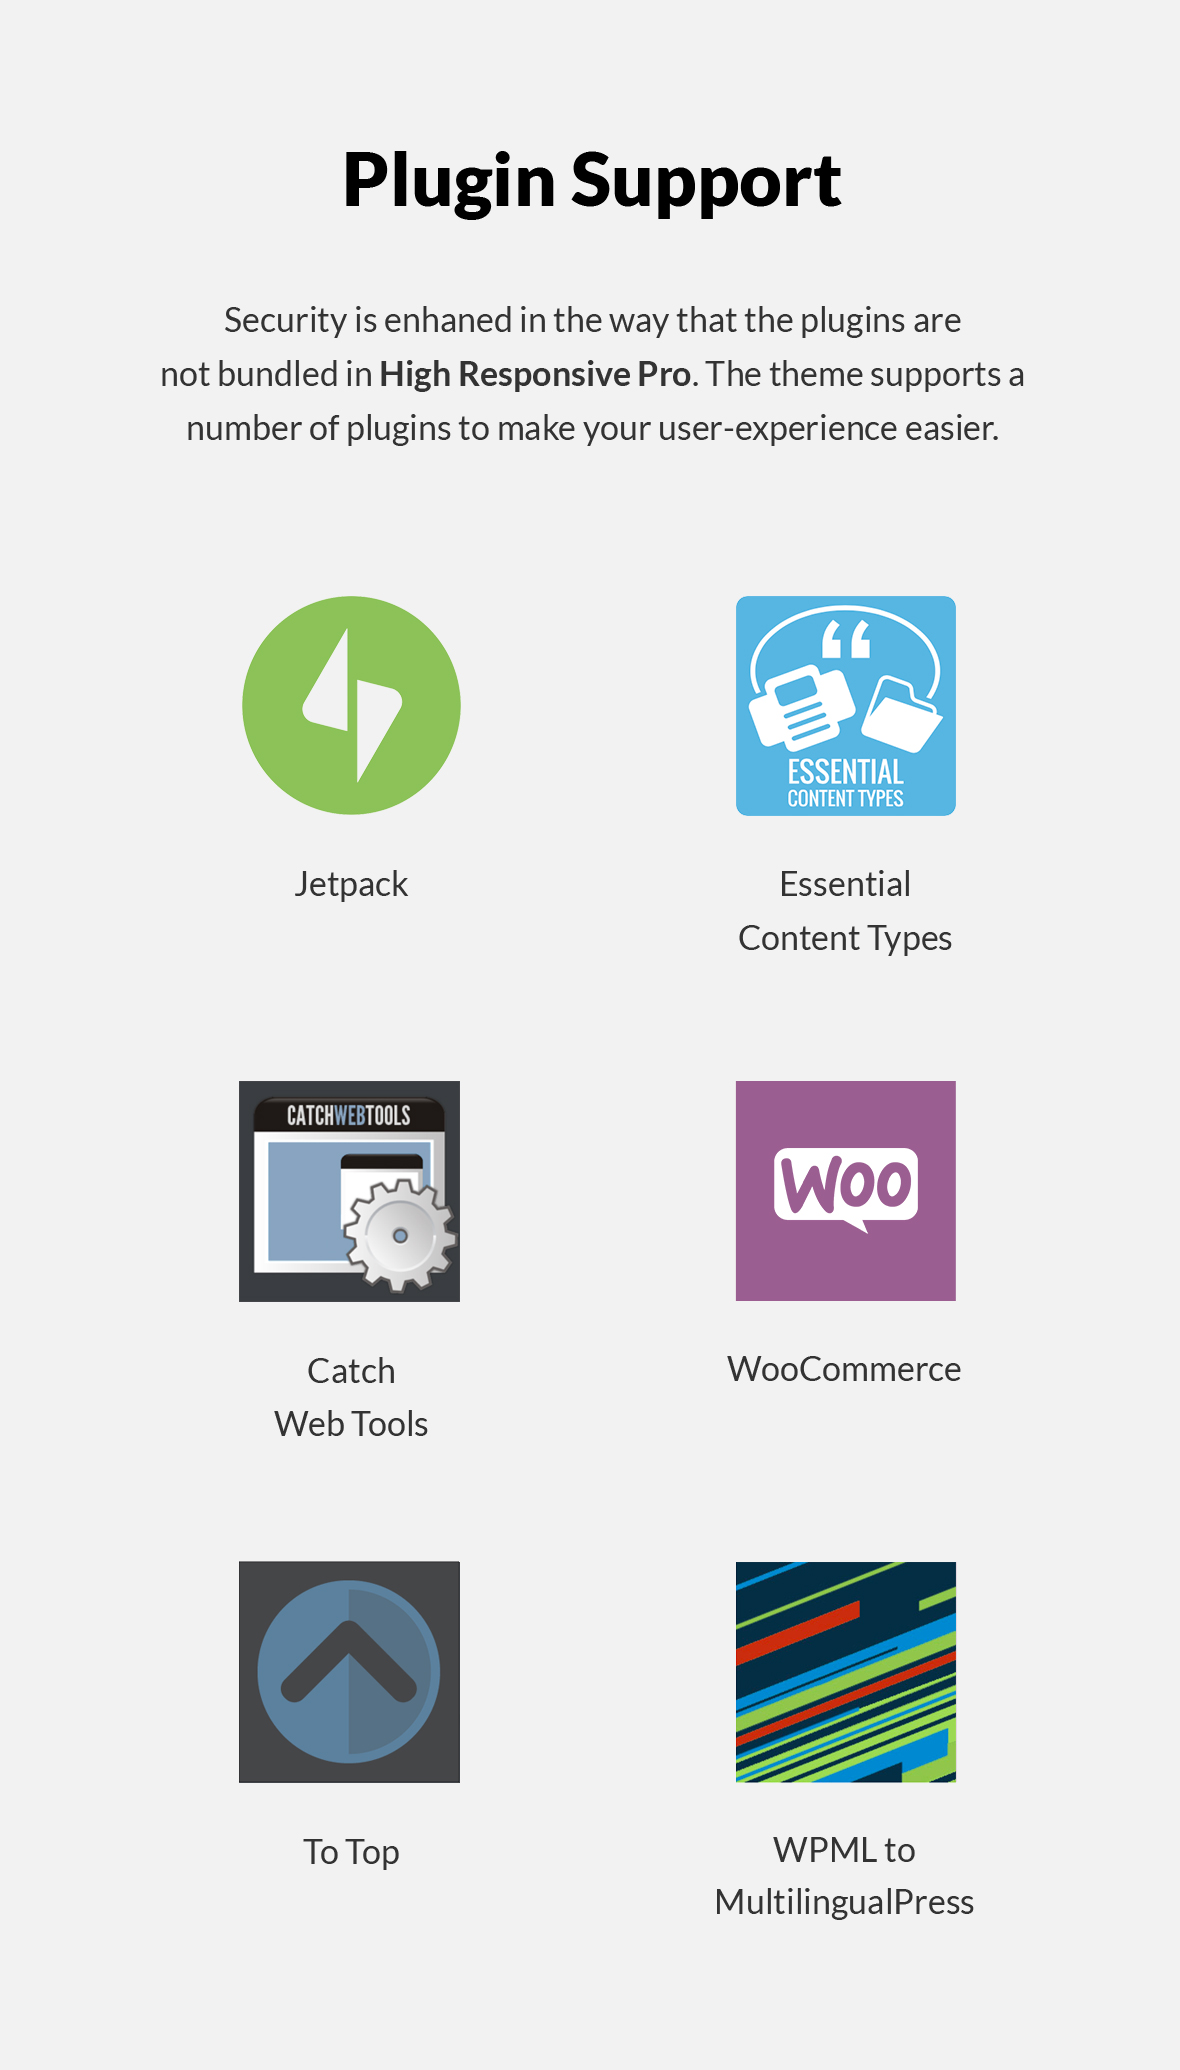 plugins.jpg